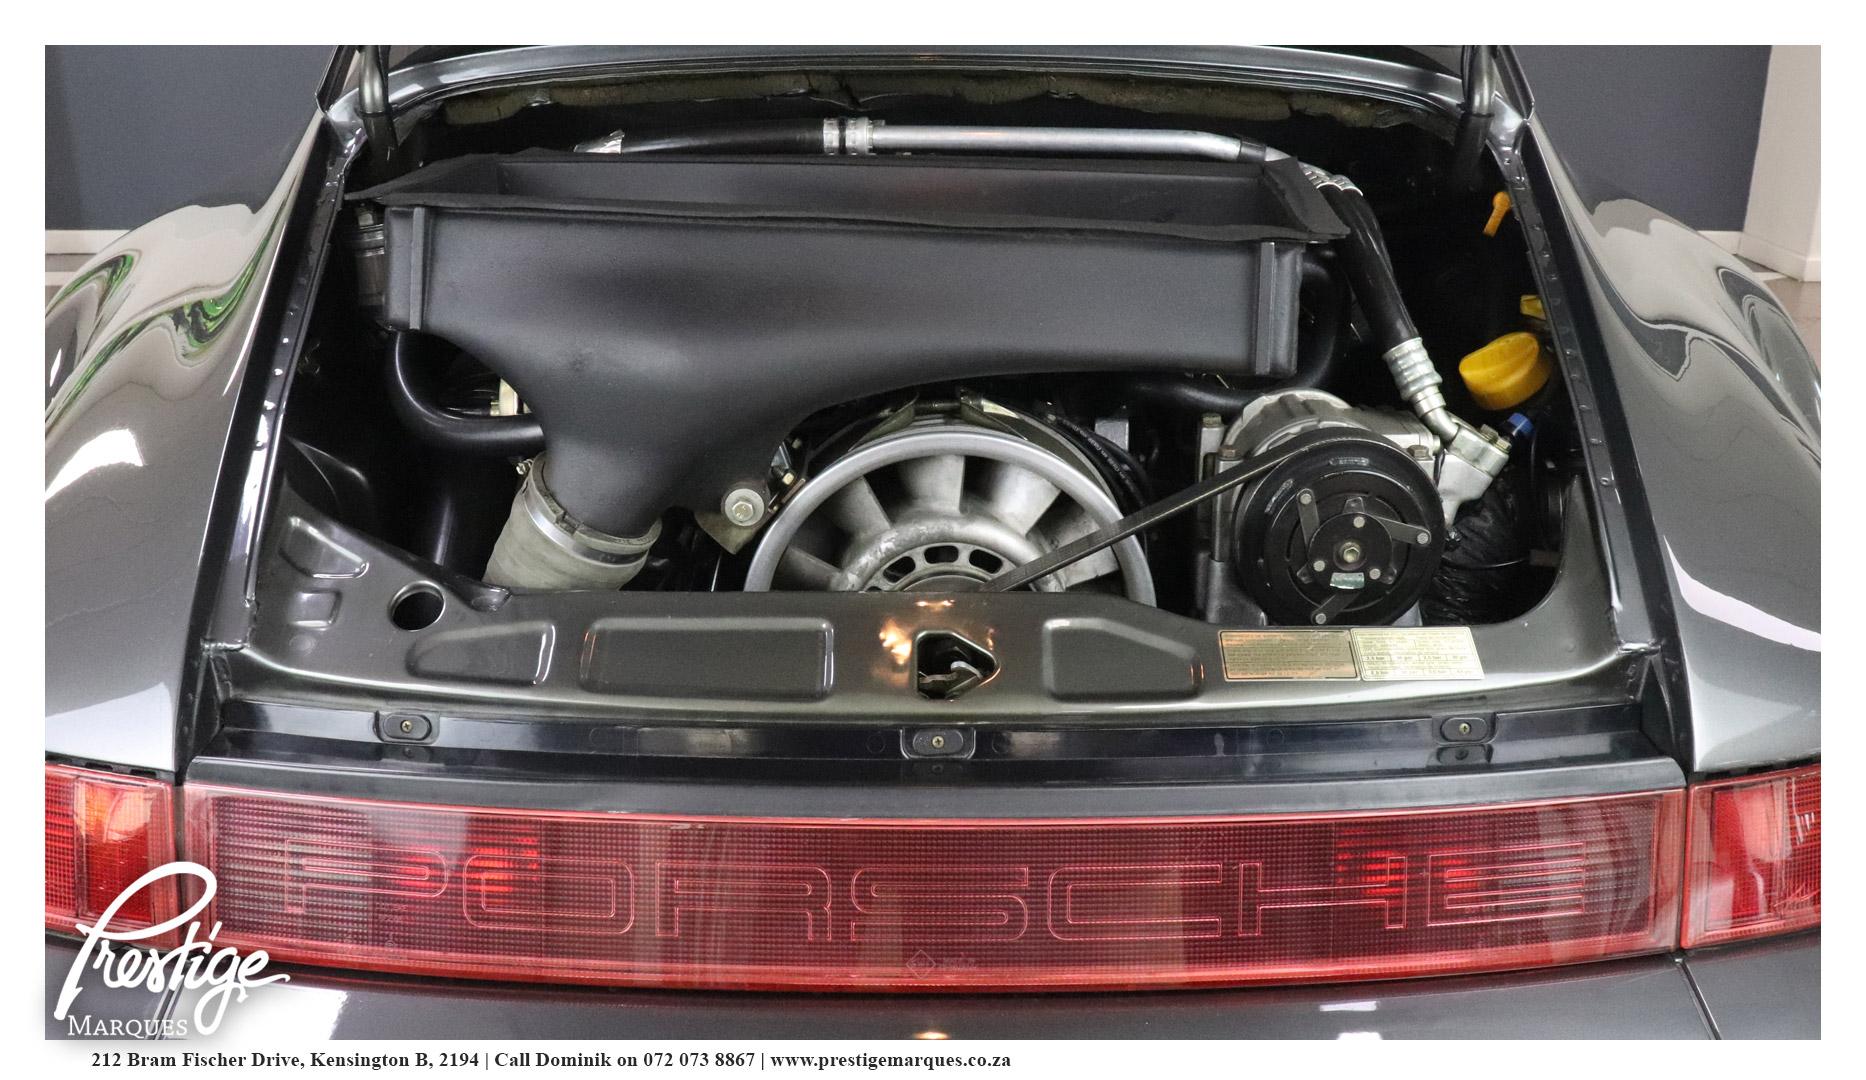 Porsche-911-964-turbo-3:3-Prestige-Marques-Sandton-Randburg-13